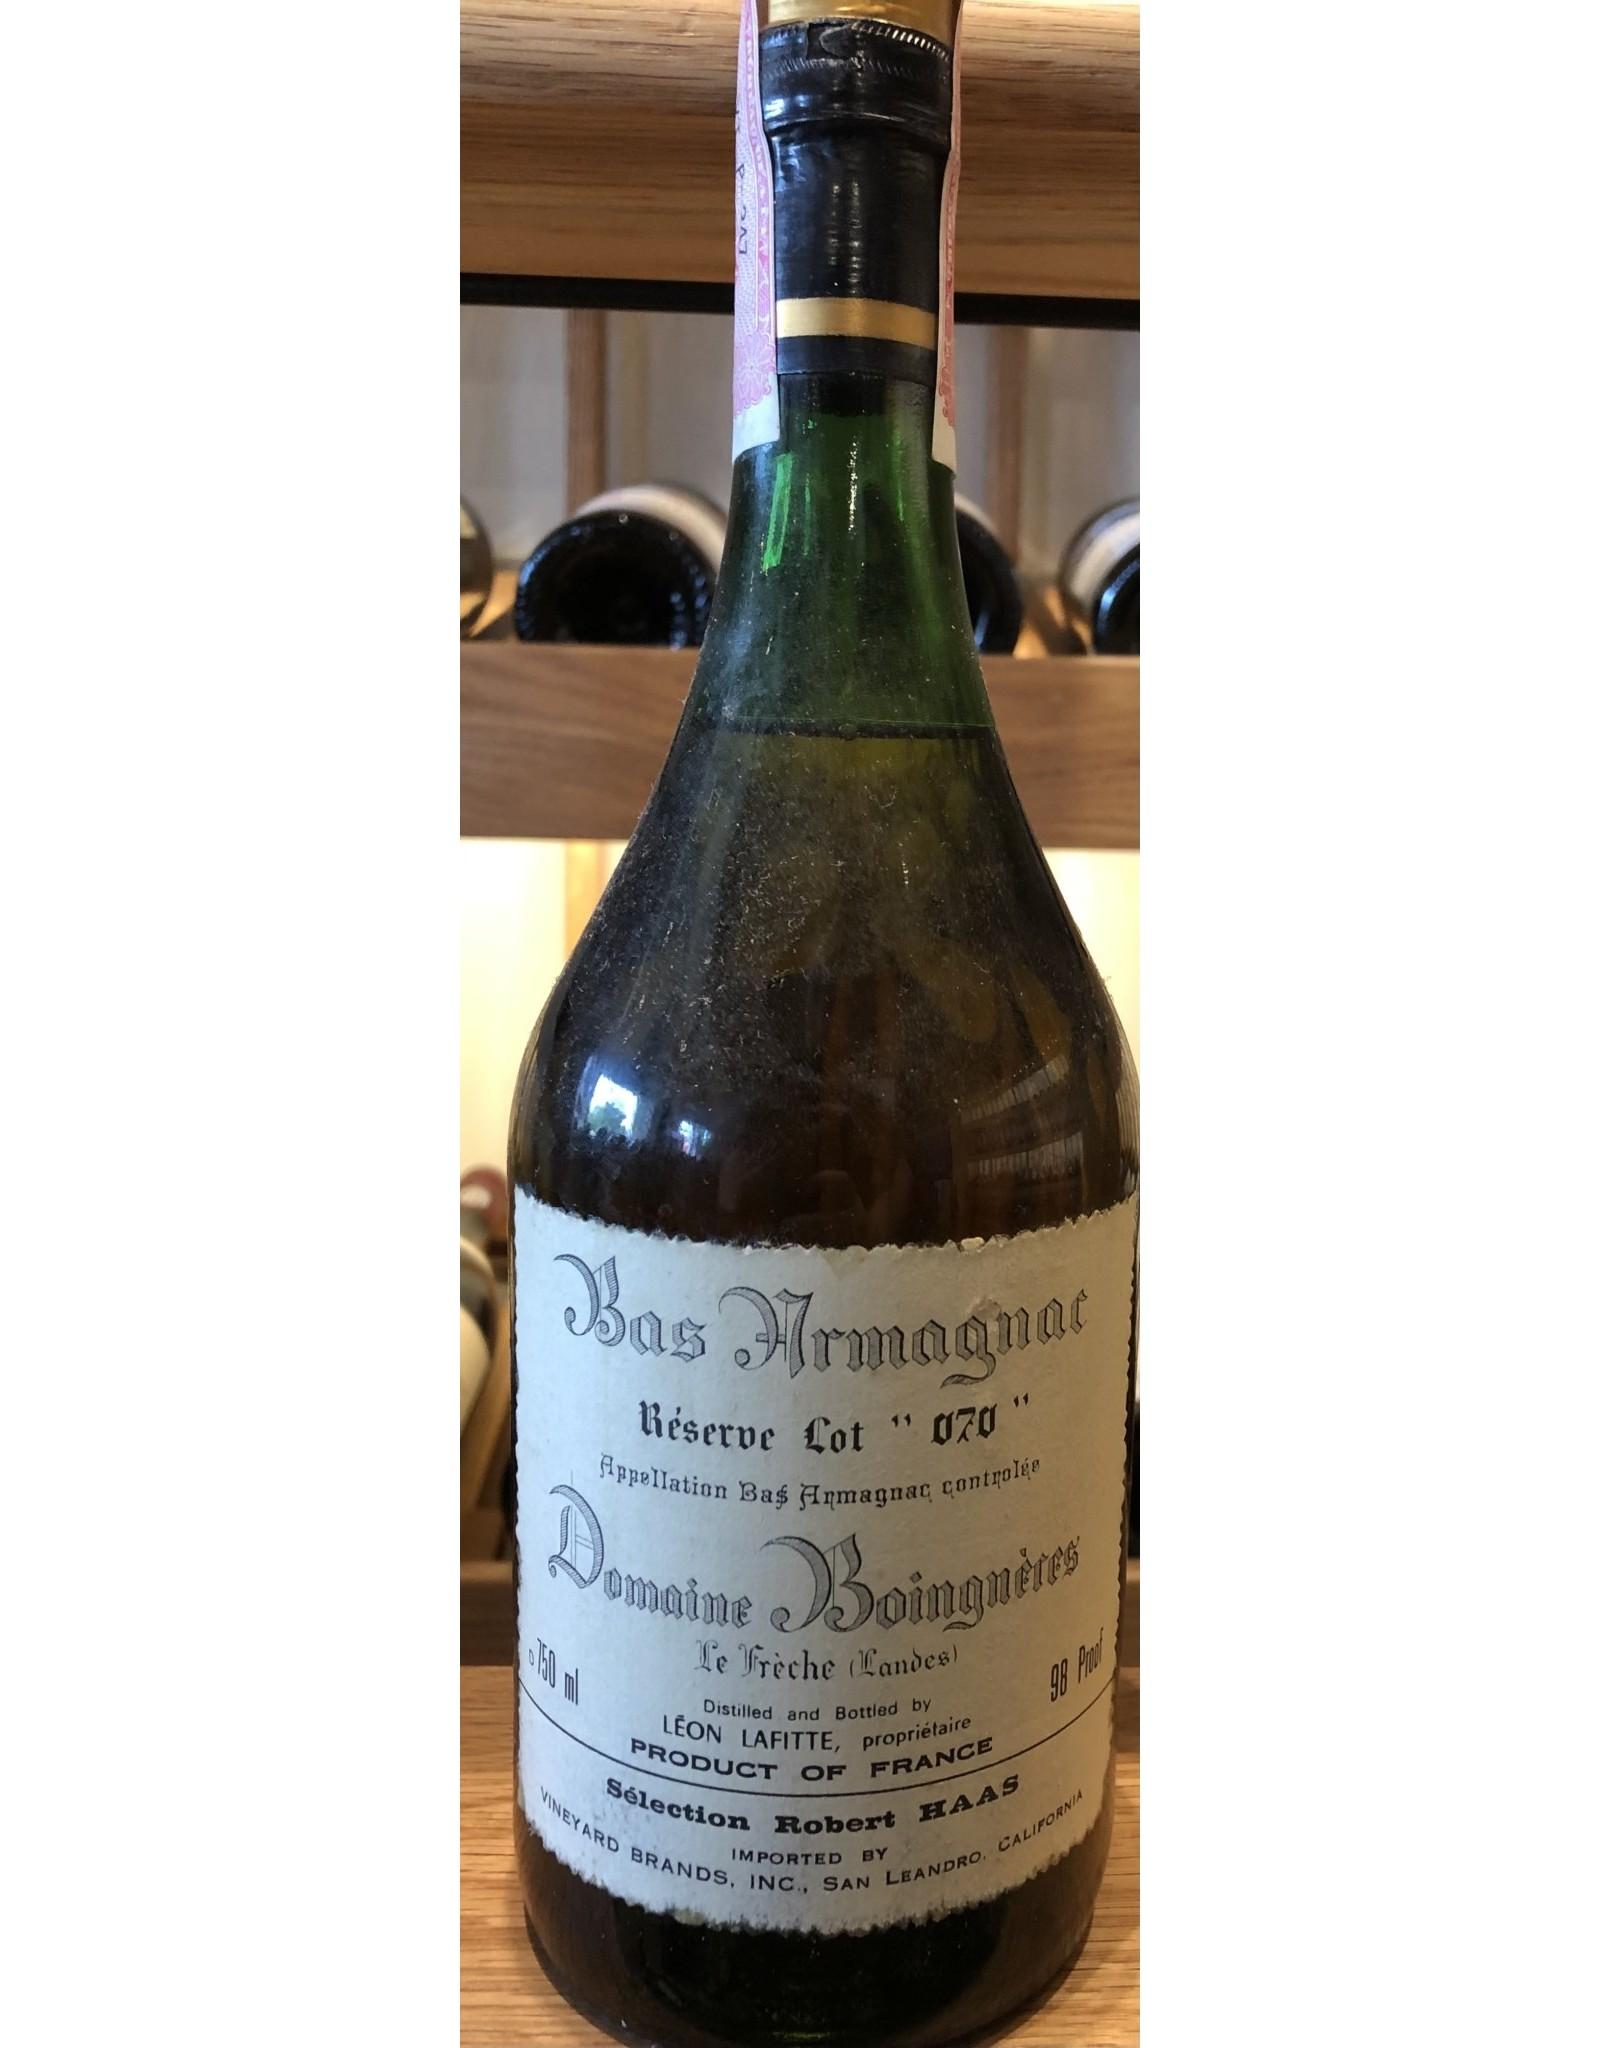 "Domaine Boingneres Bas Armagnac Reserve Lot ""070"" (Bottled 1980s)"